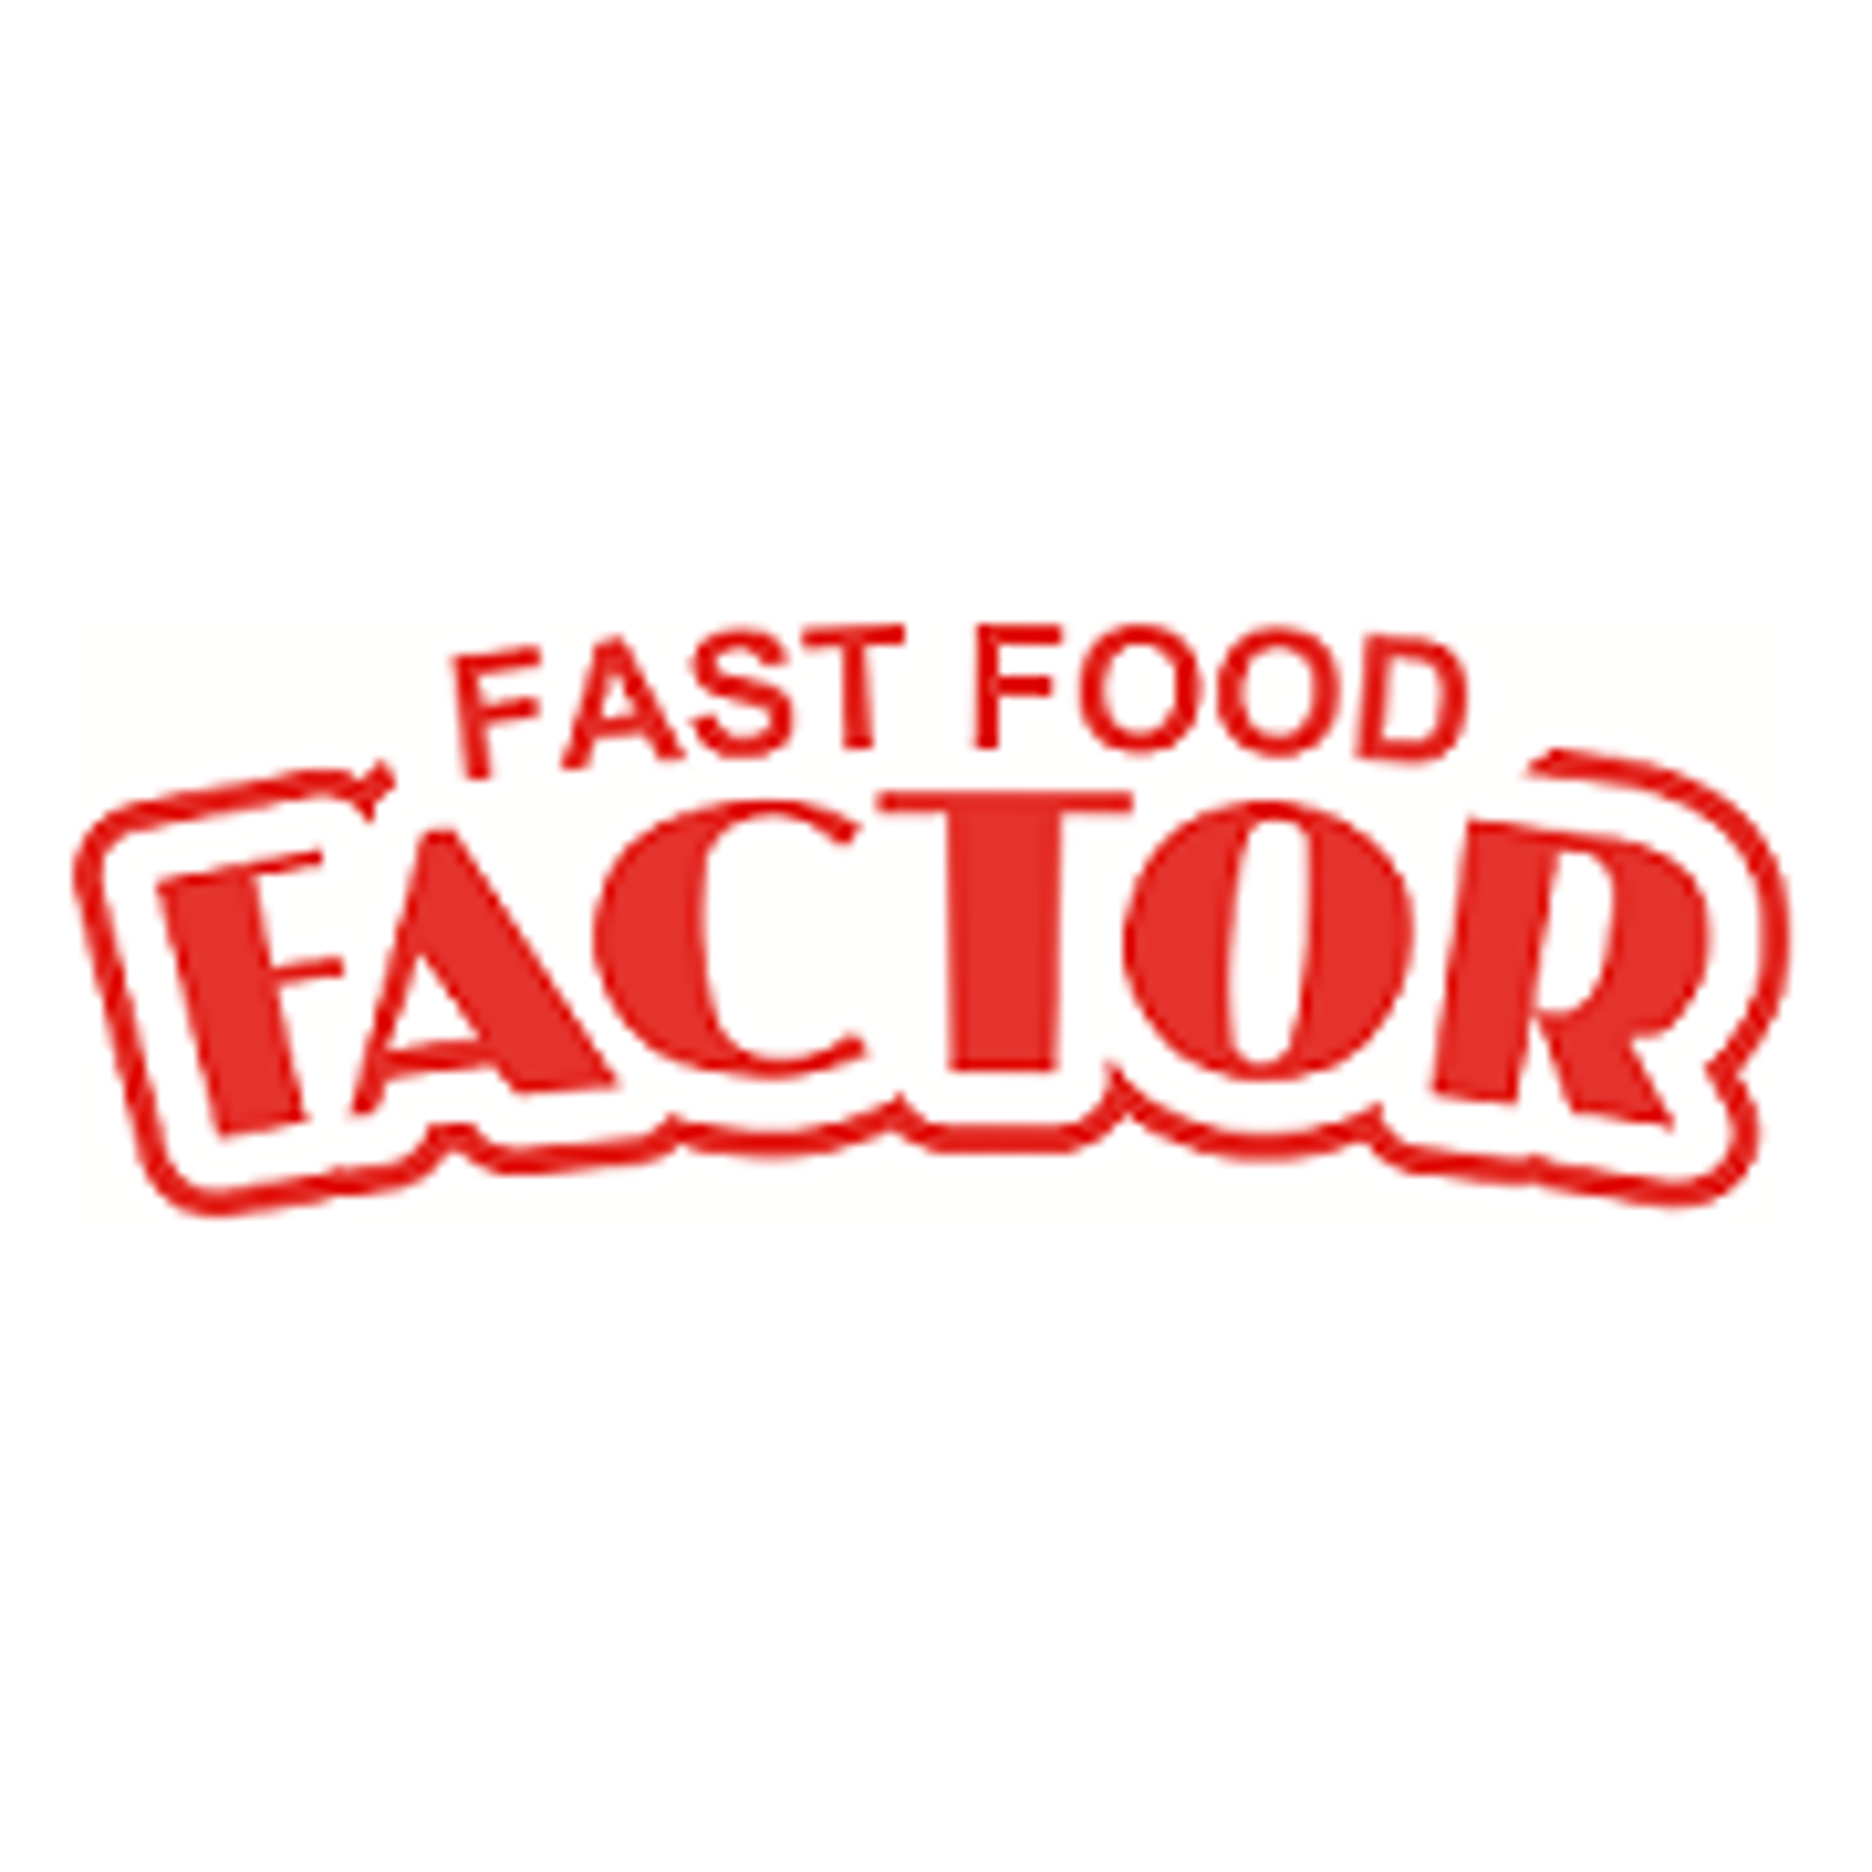 Factor Чаталджа